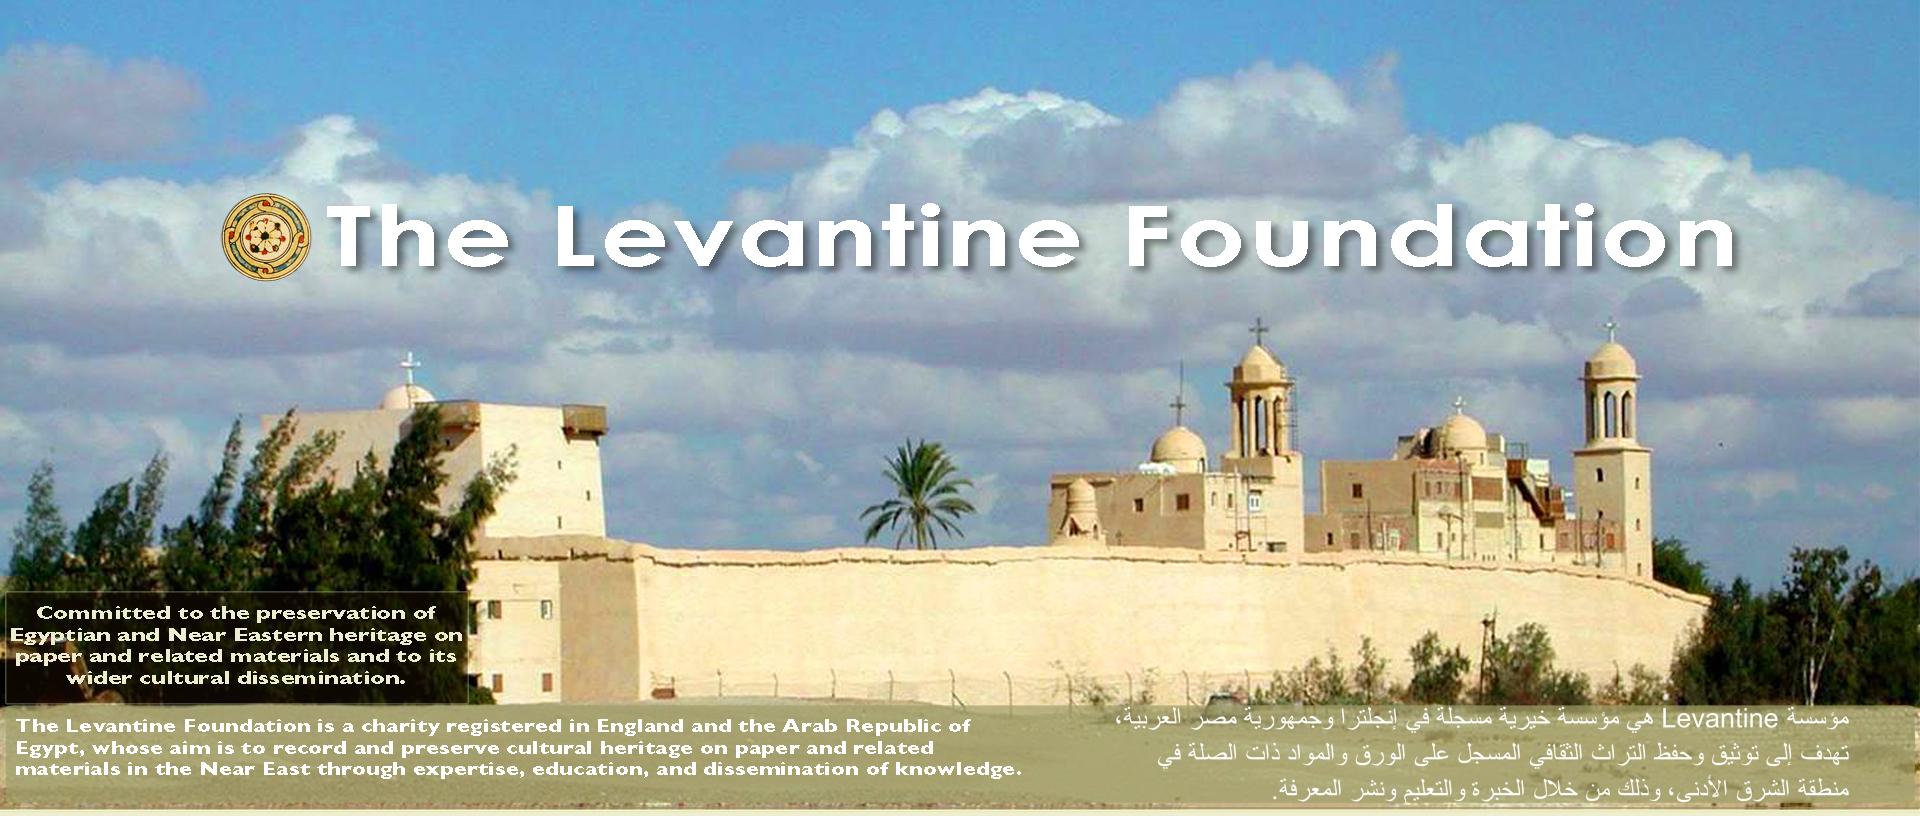 The Levantine Foundation